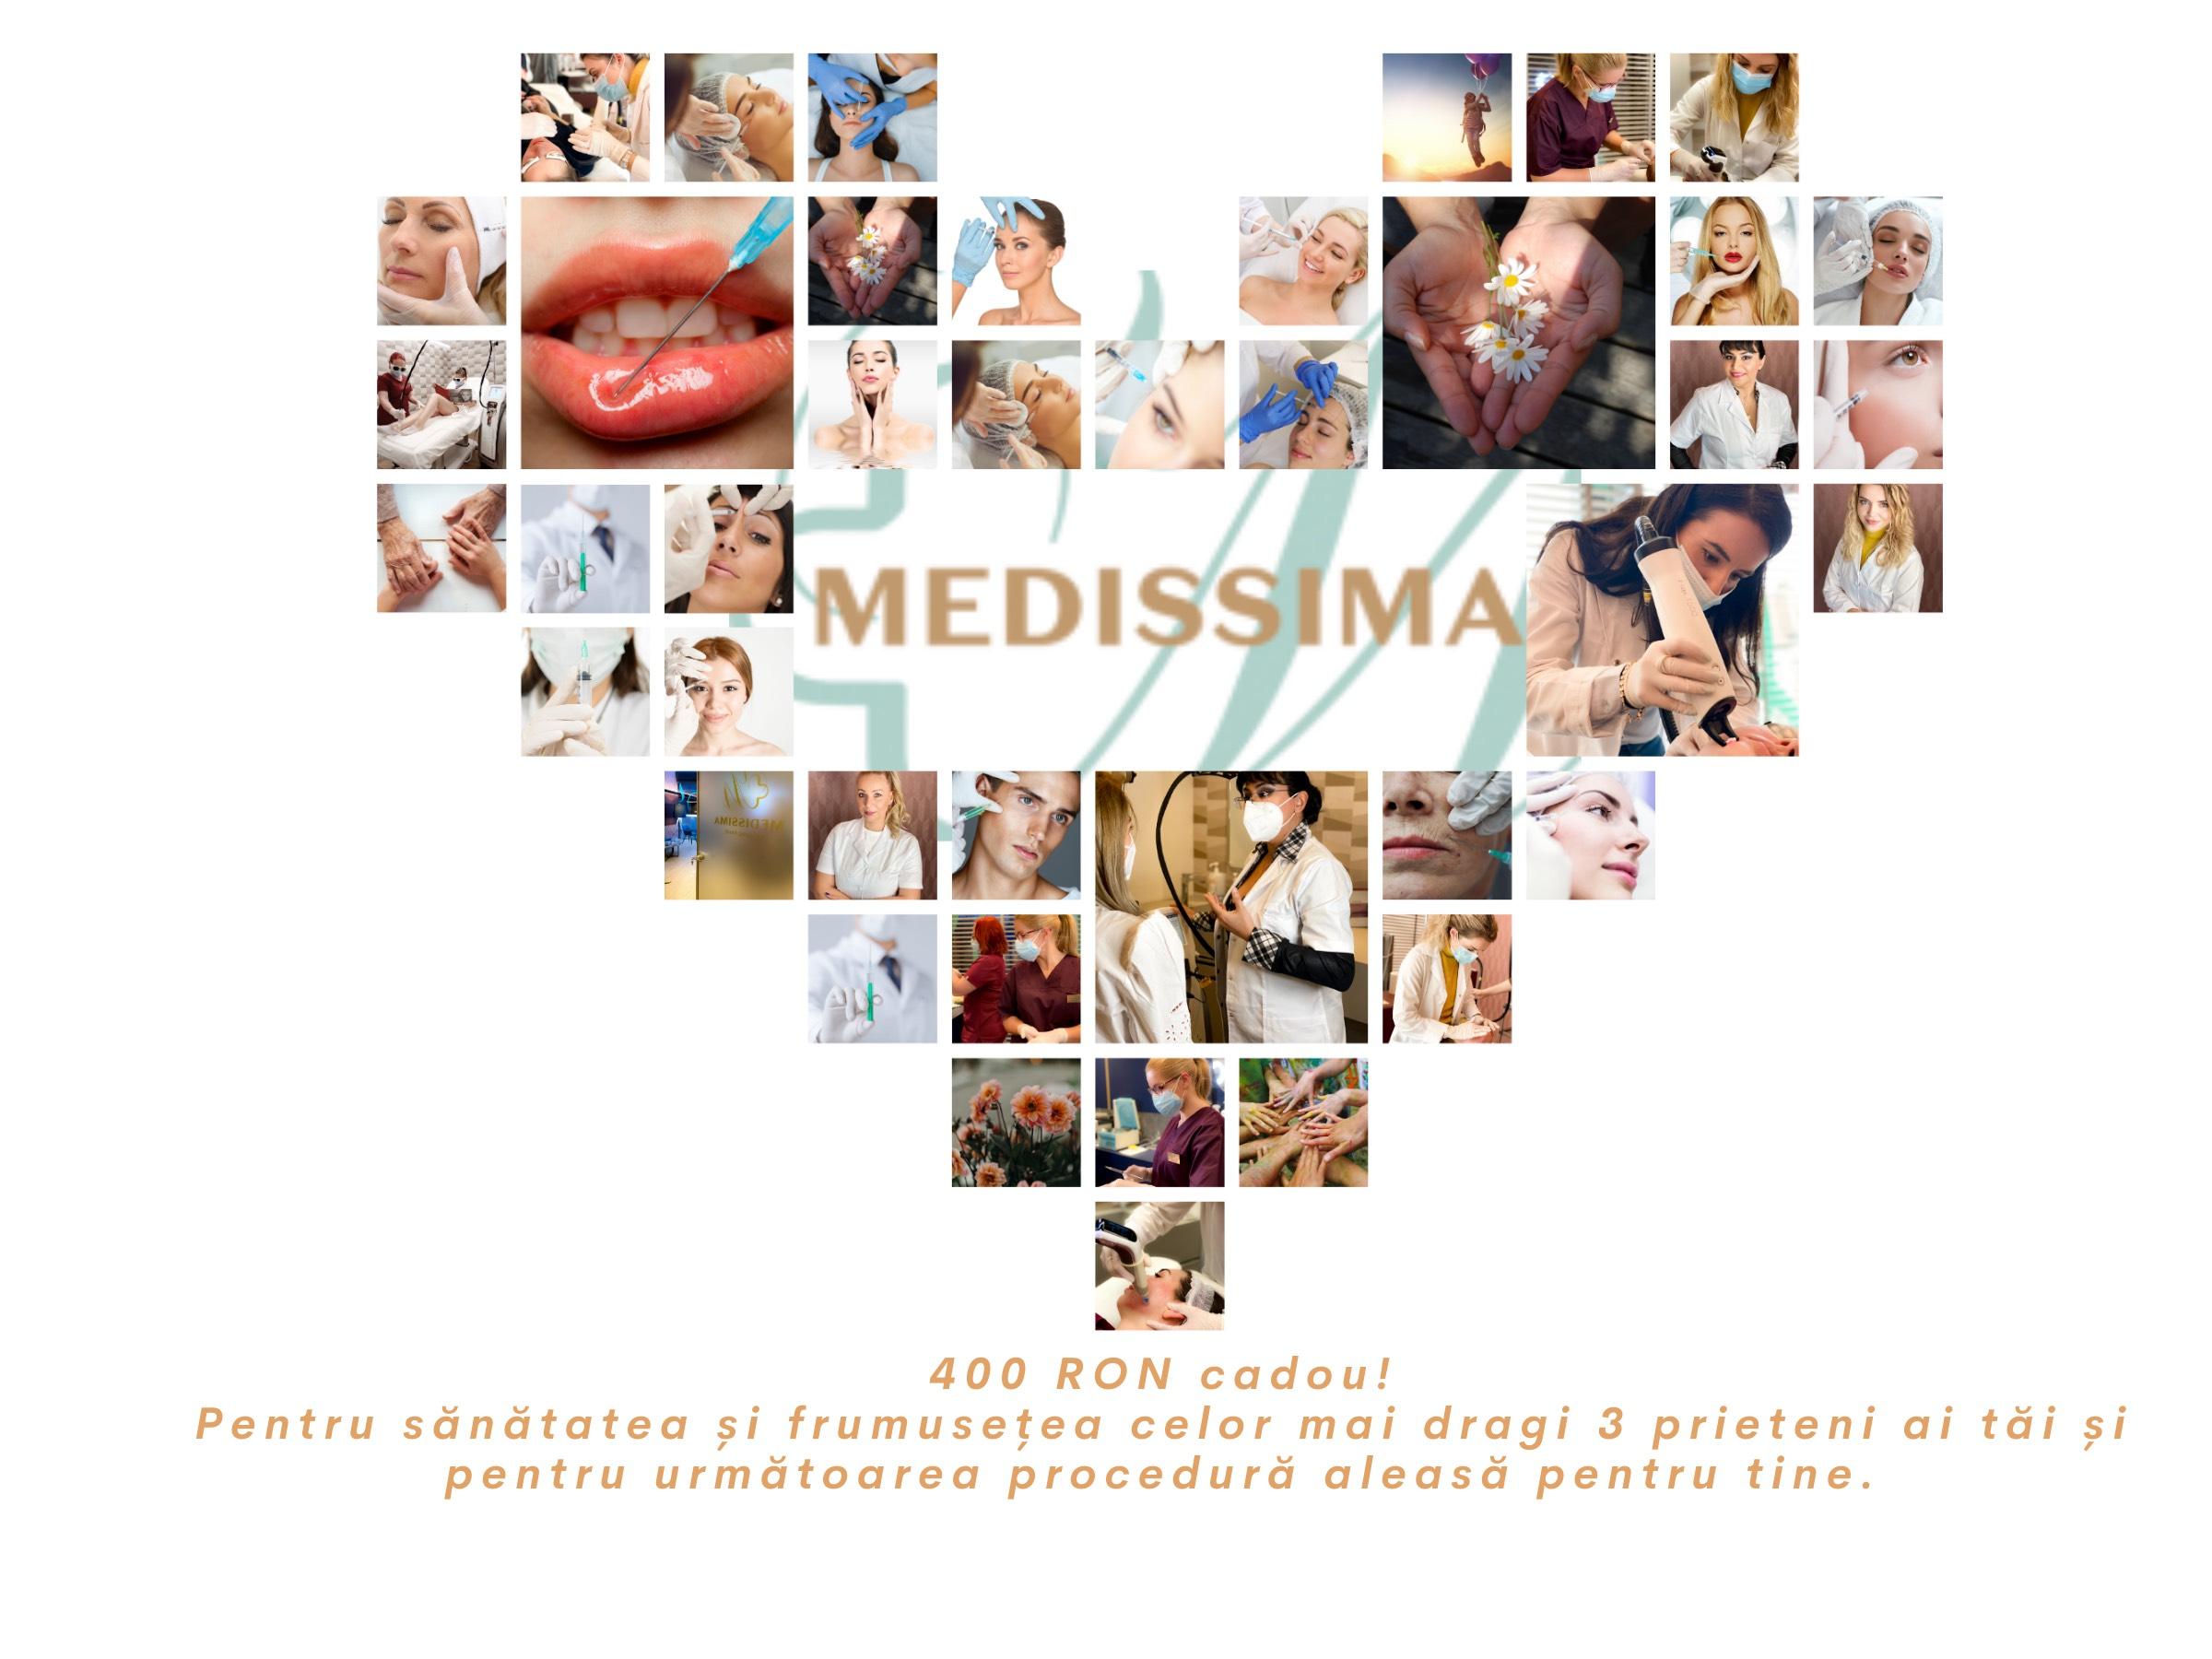 Medissimasusțineprietenia 400